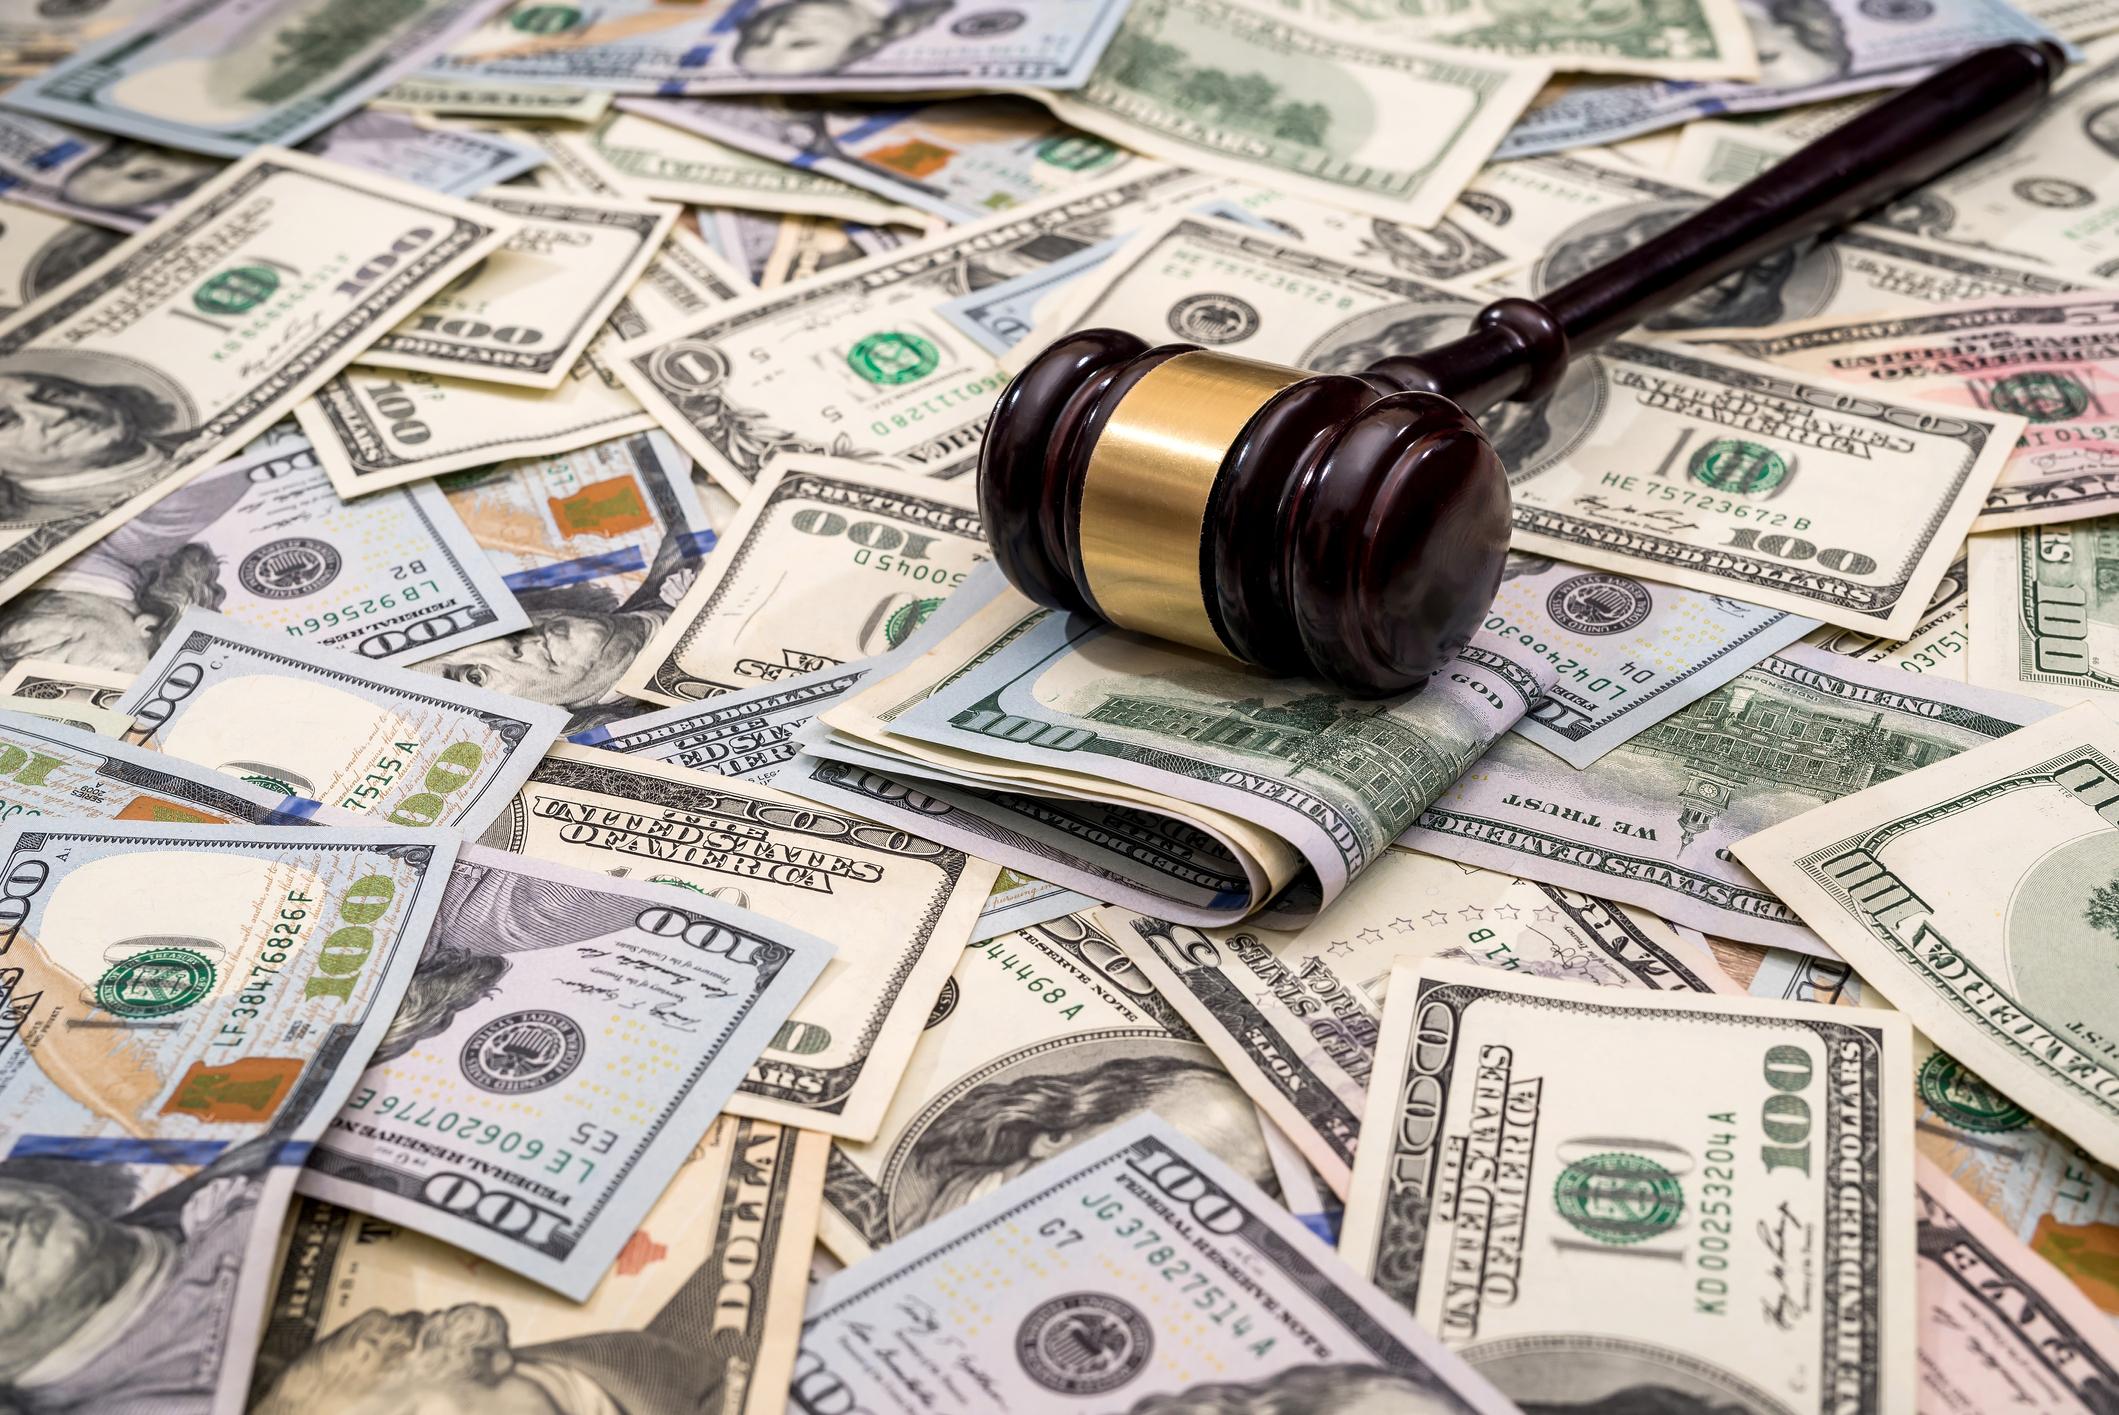 california cash bail reform featured image